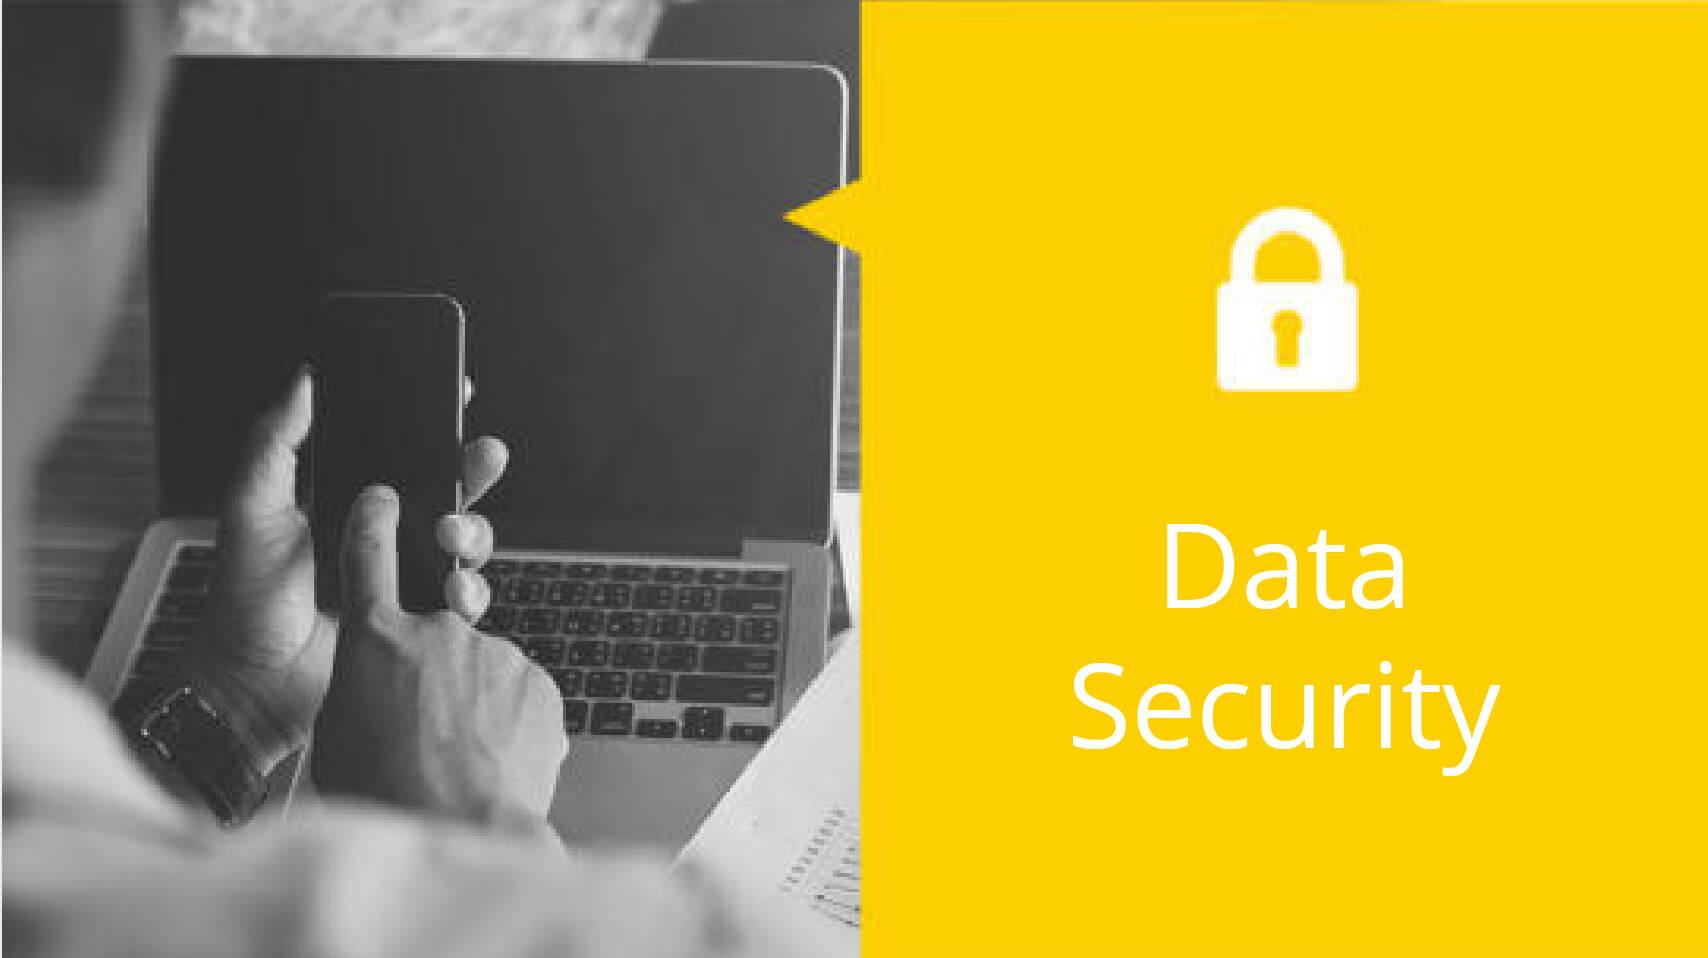 Fingerpritn Application for Data Security